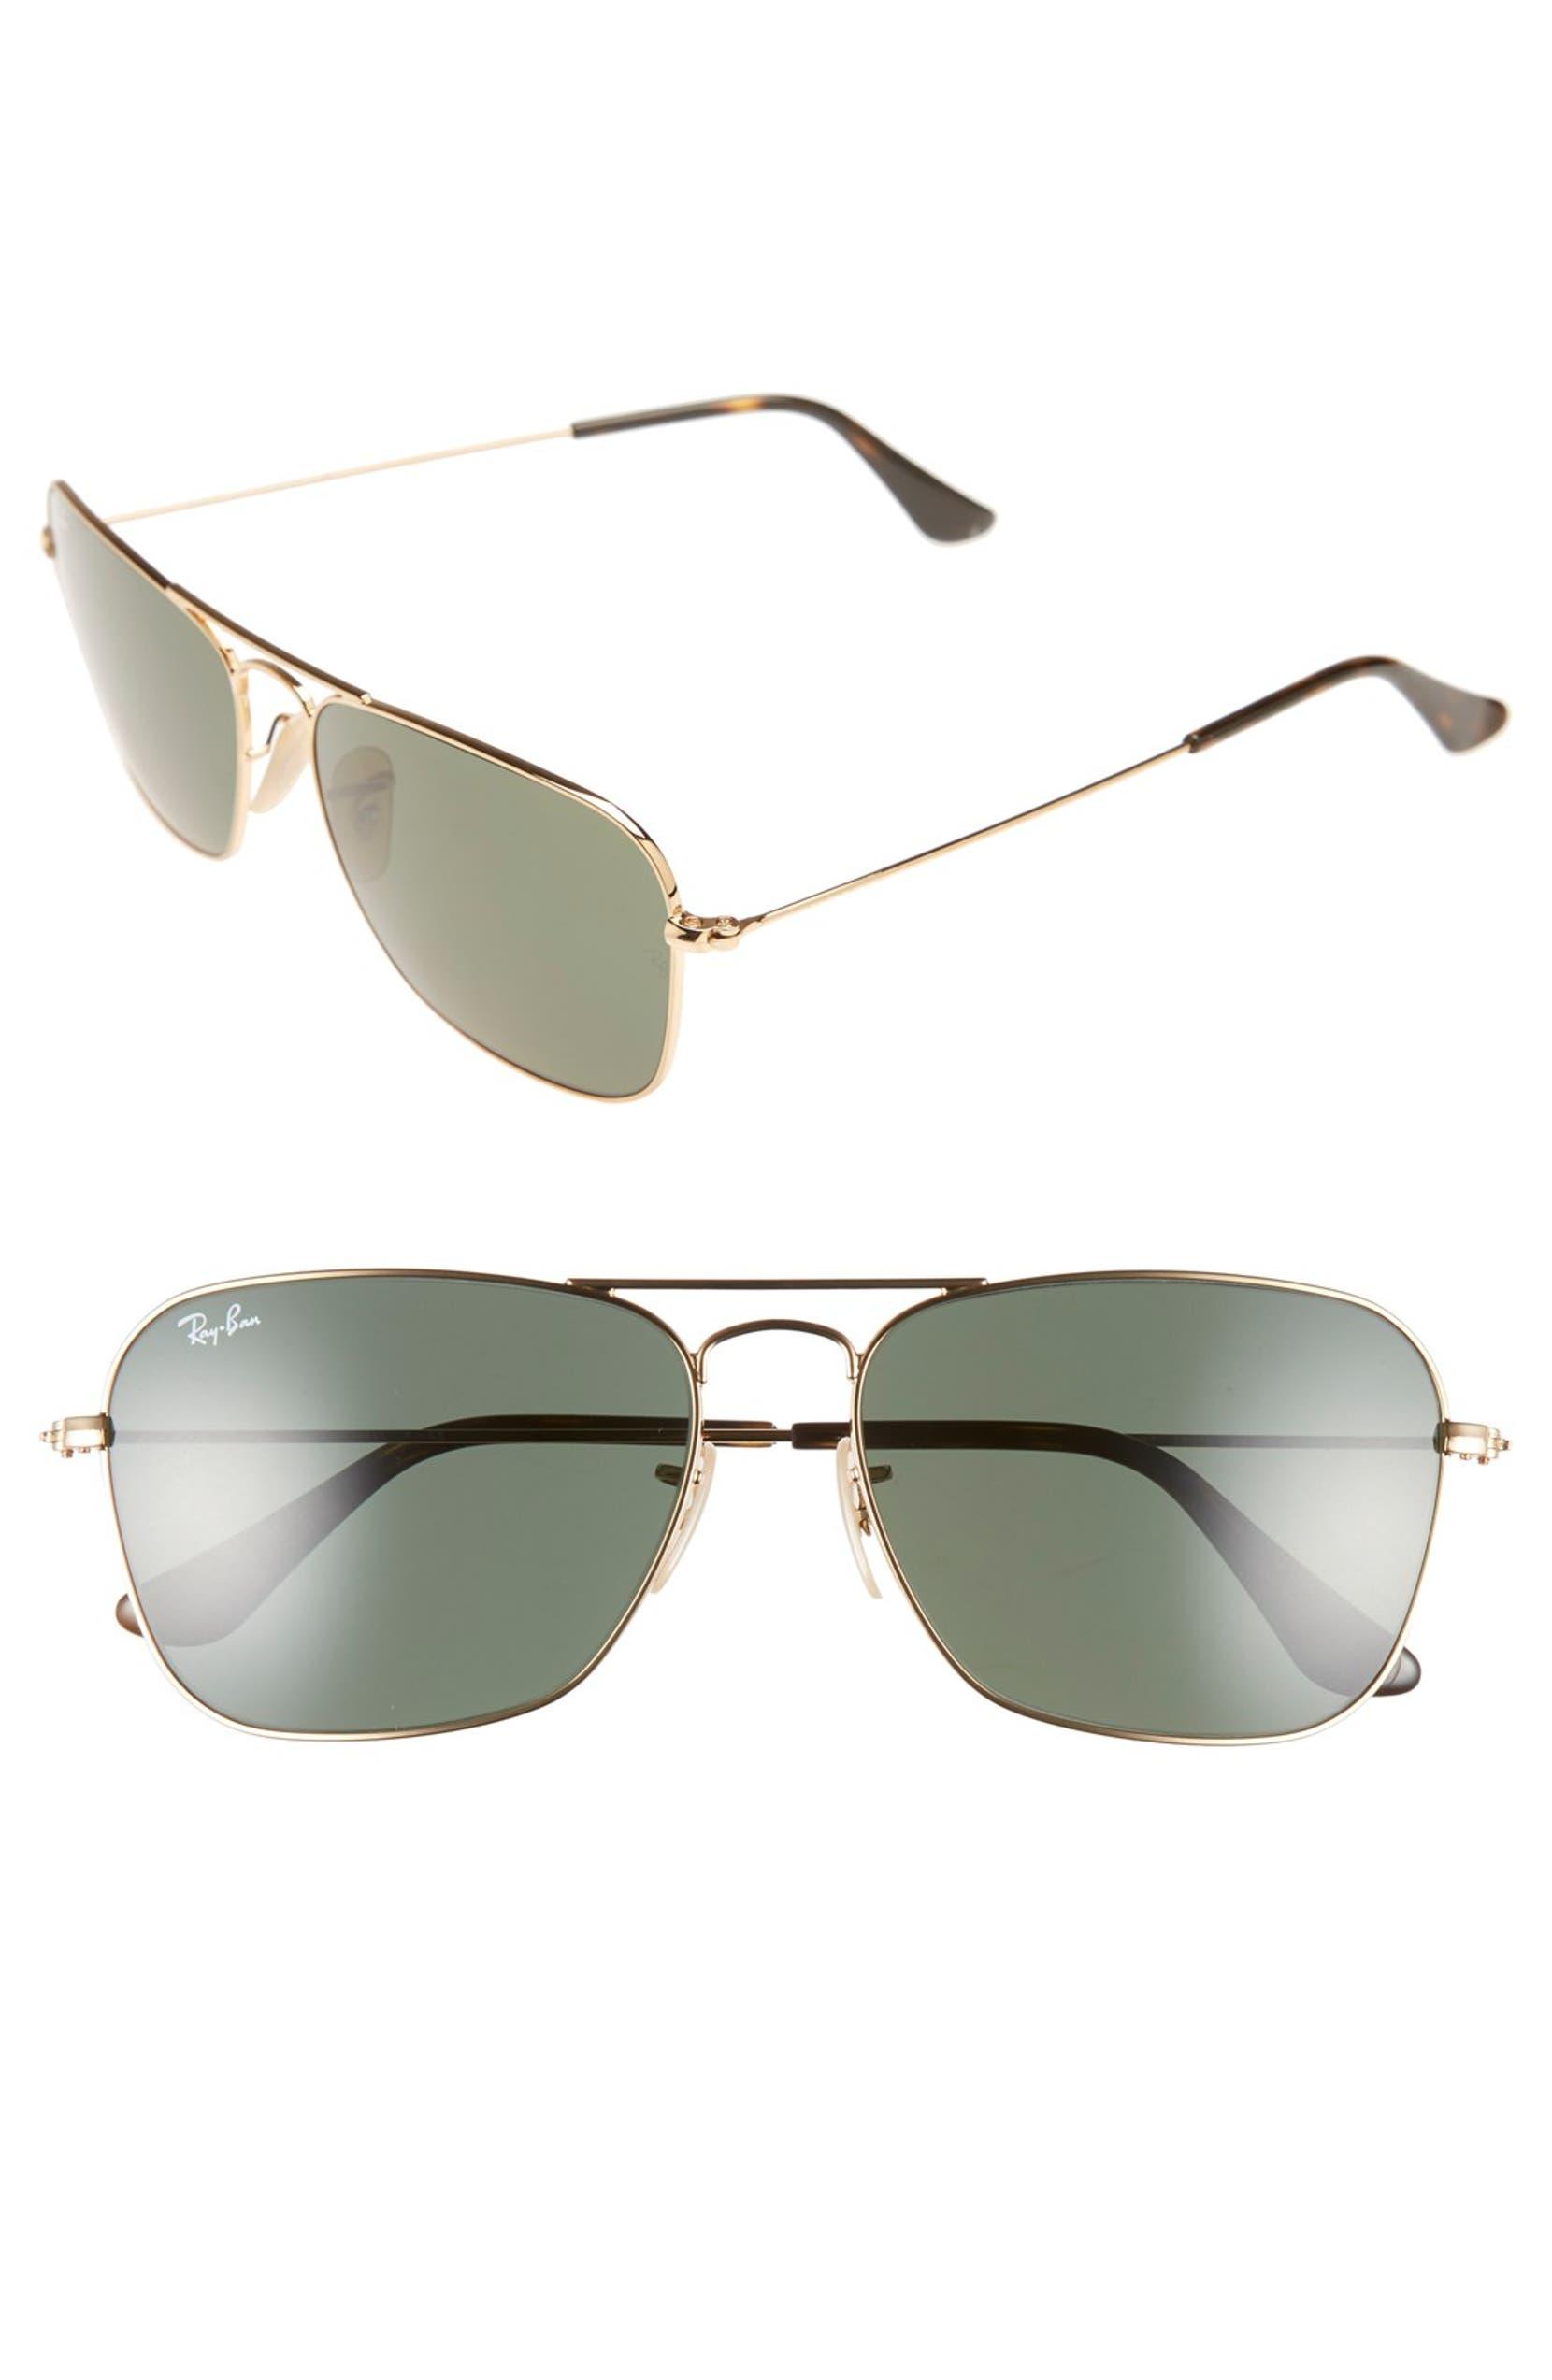 67782346617 Ray-Ban Caravan 58mm Aviator Sunglasses